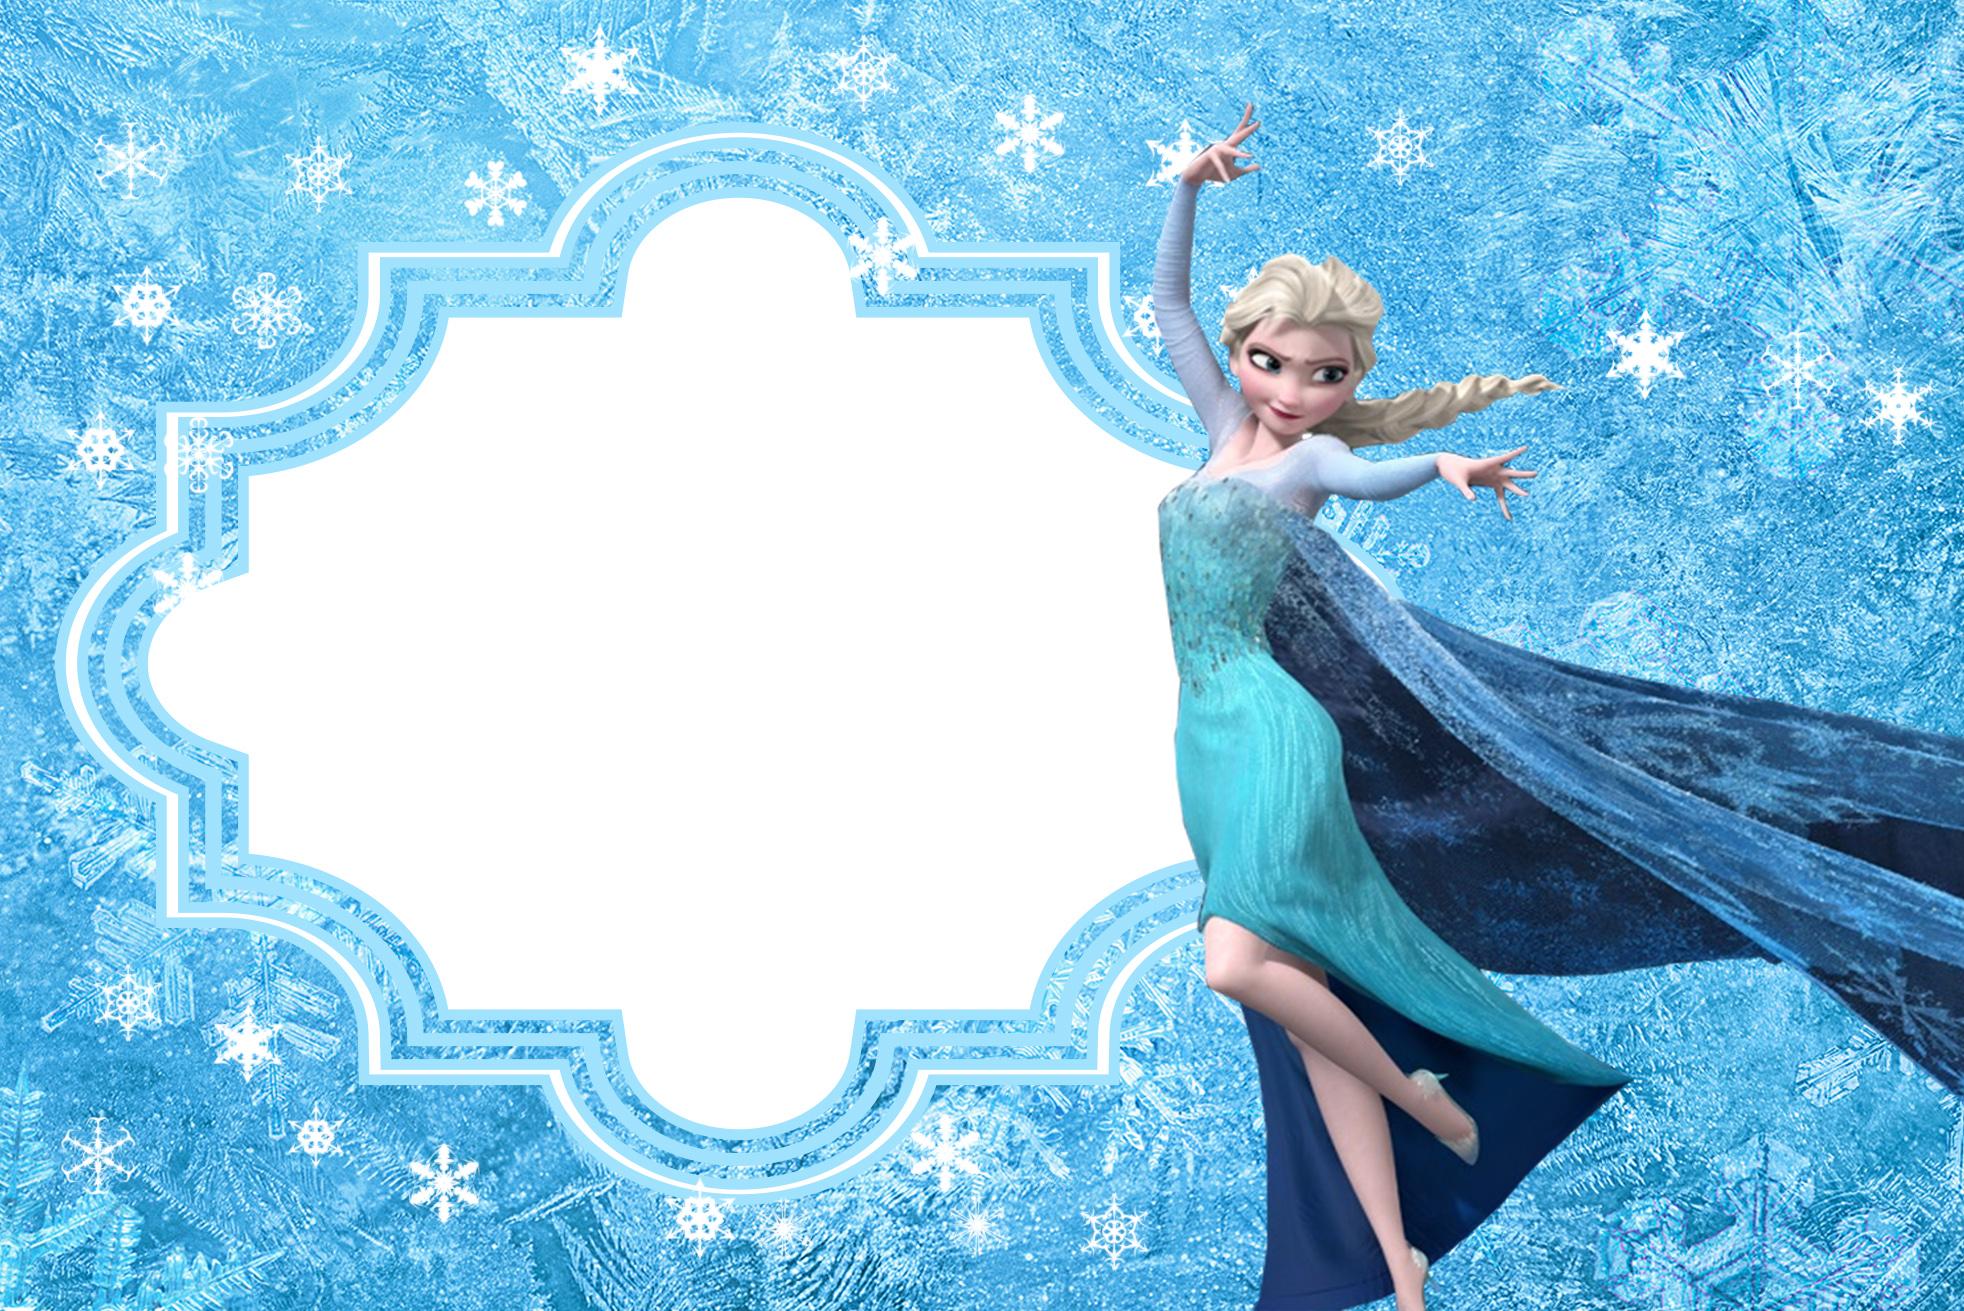 Convite Frozen 116 PNG Grátis para baixar jpg,png.